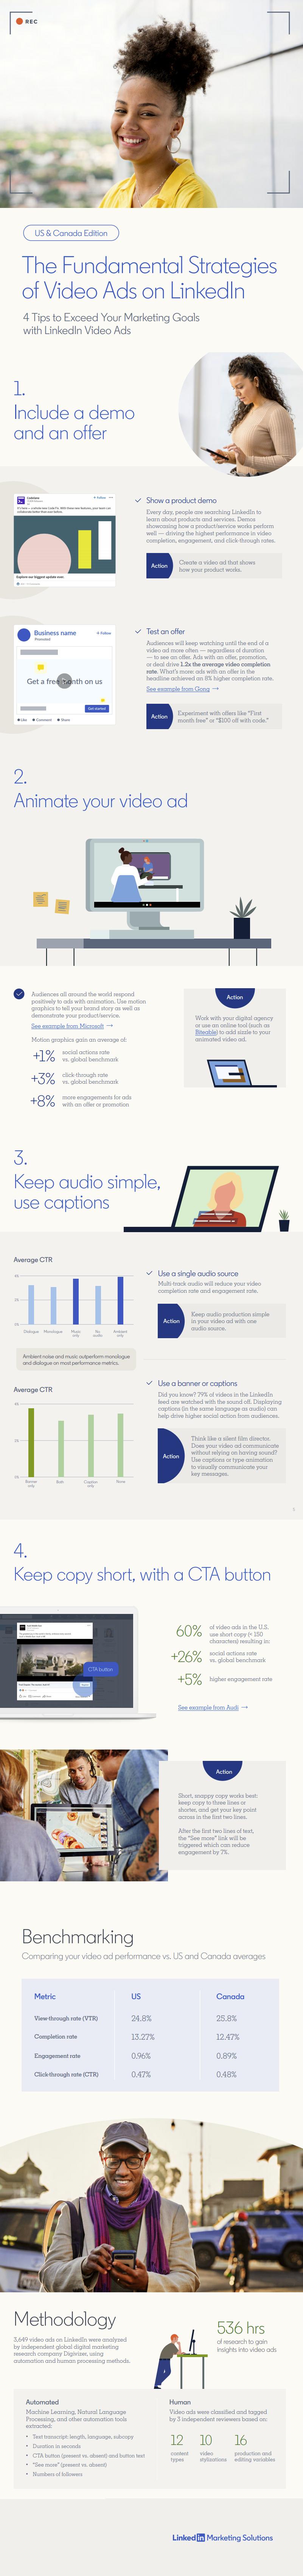 LinkedIn video ad tips